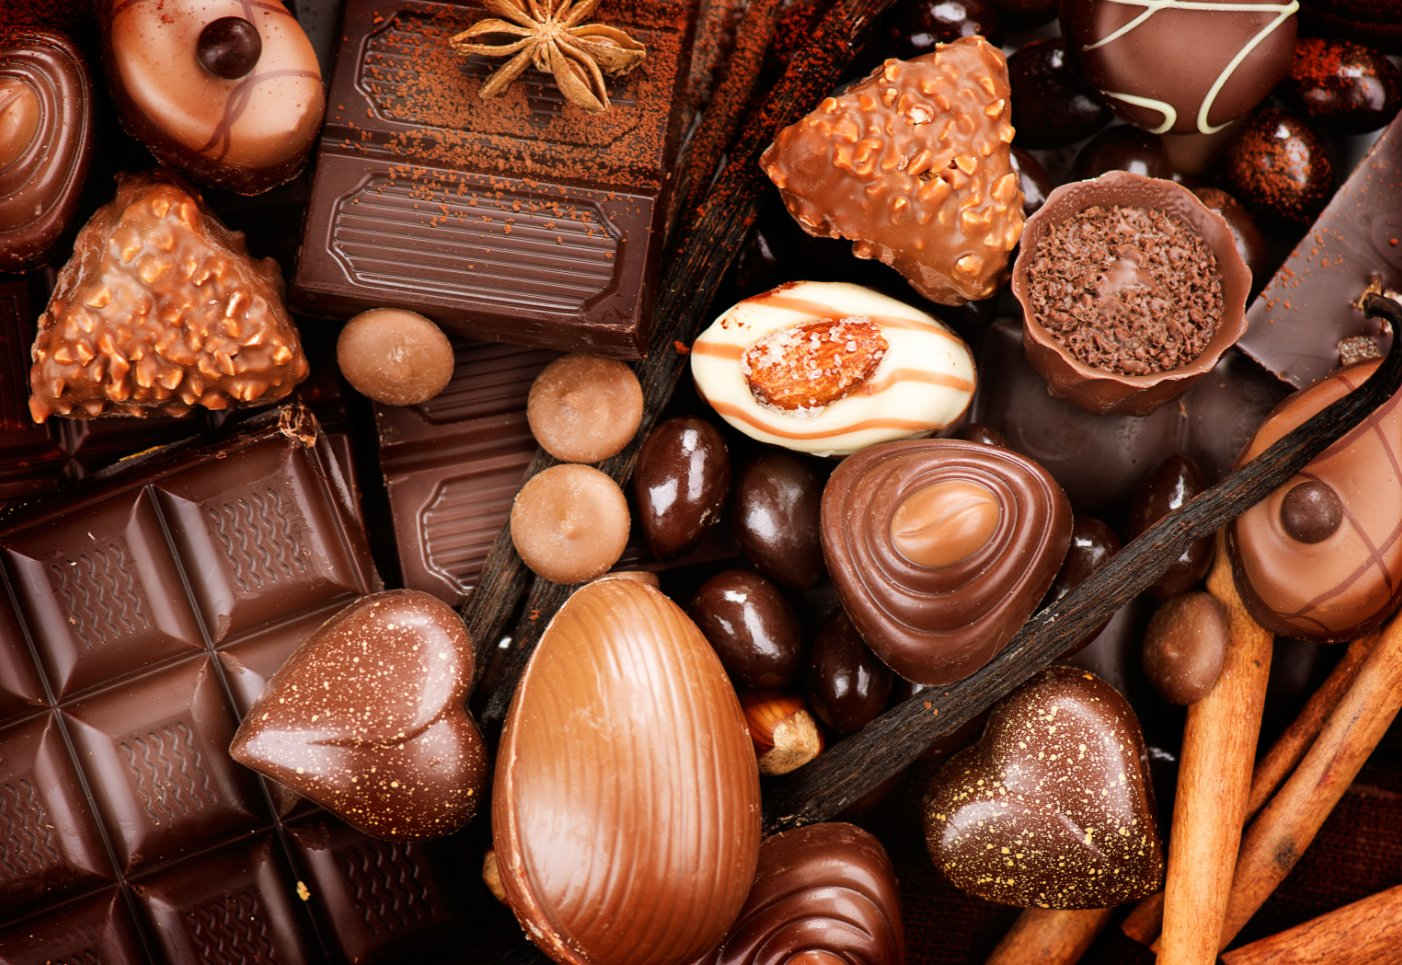 20180105000745.png?resize=1200,630 - バレンタインにおすすめ!チョコと一緒に渡したい贈り物まとめ